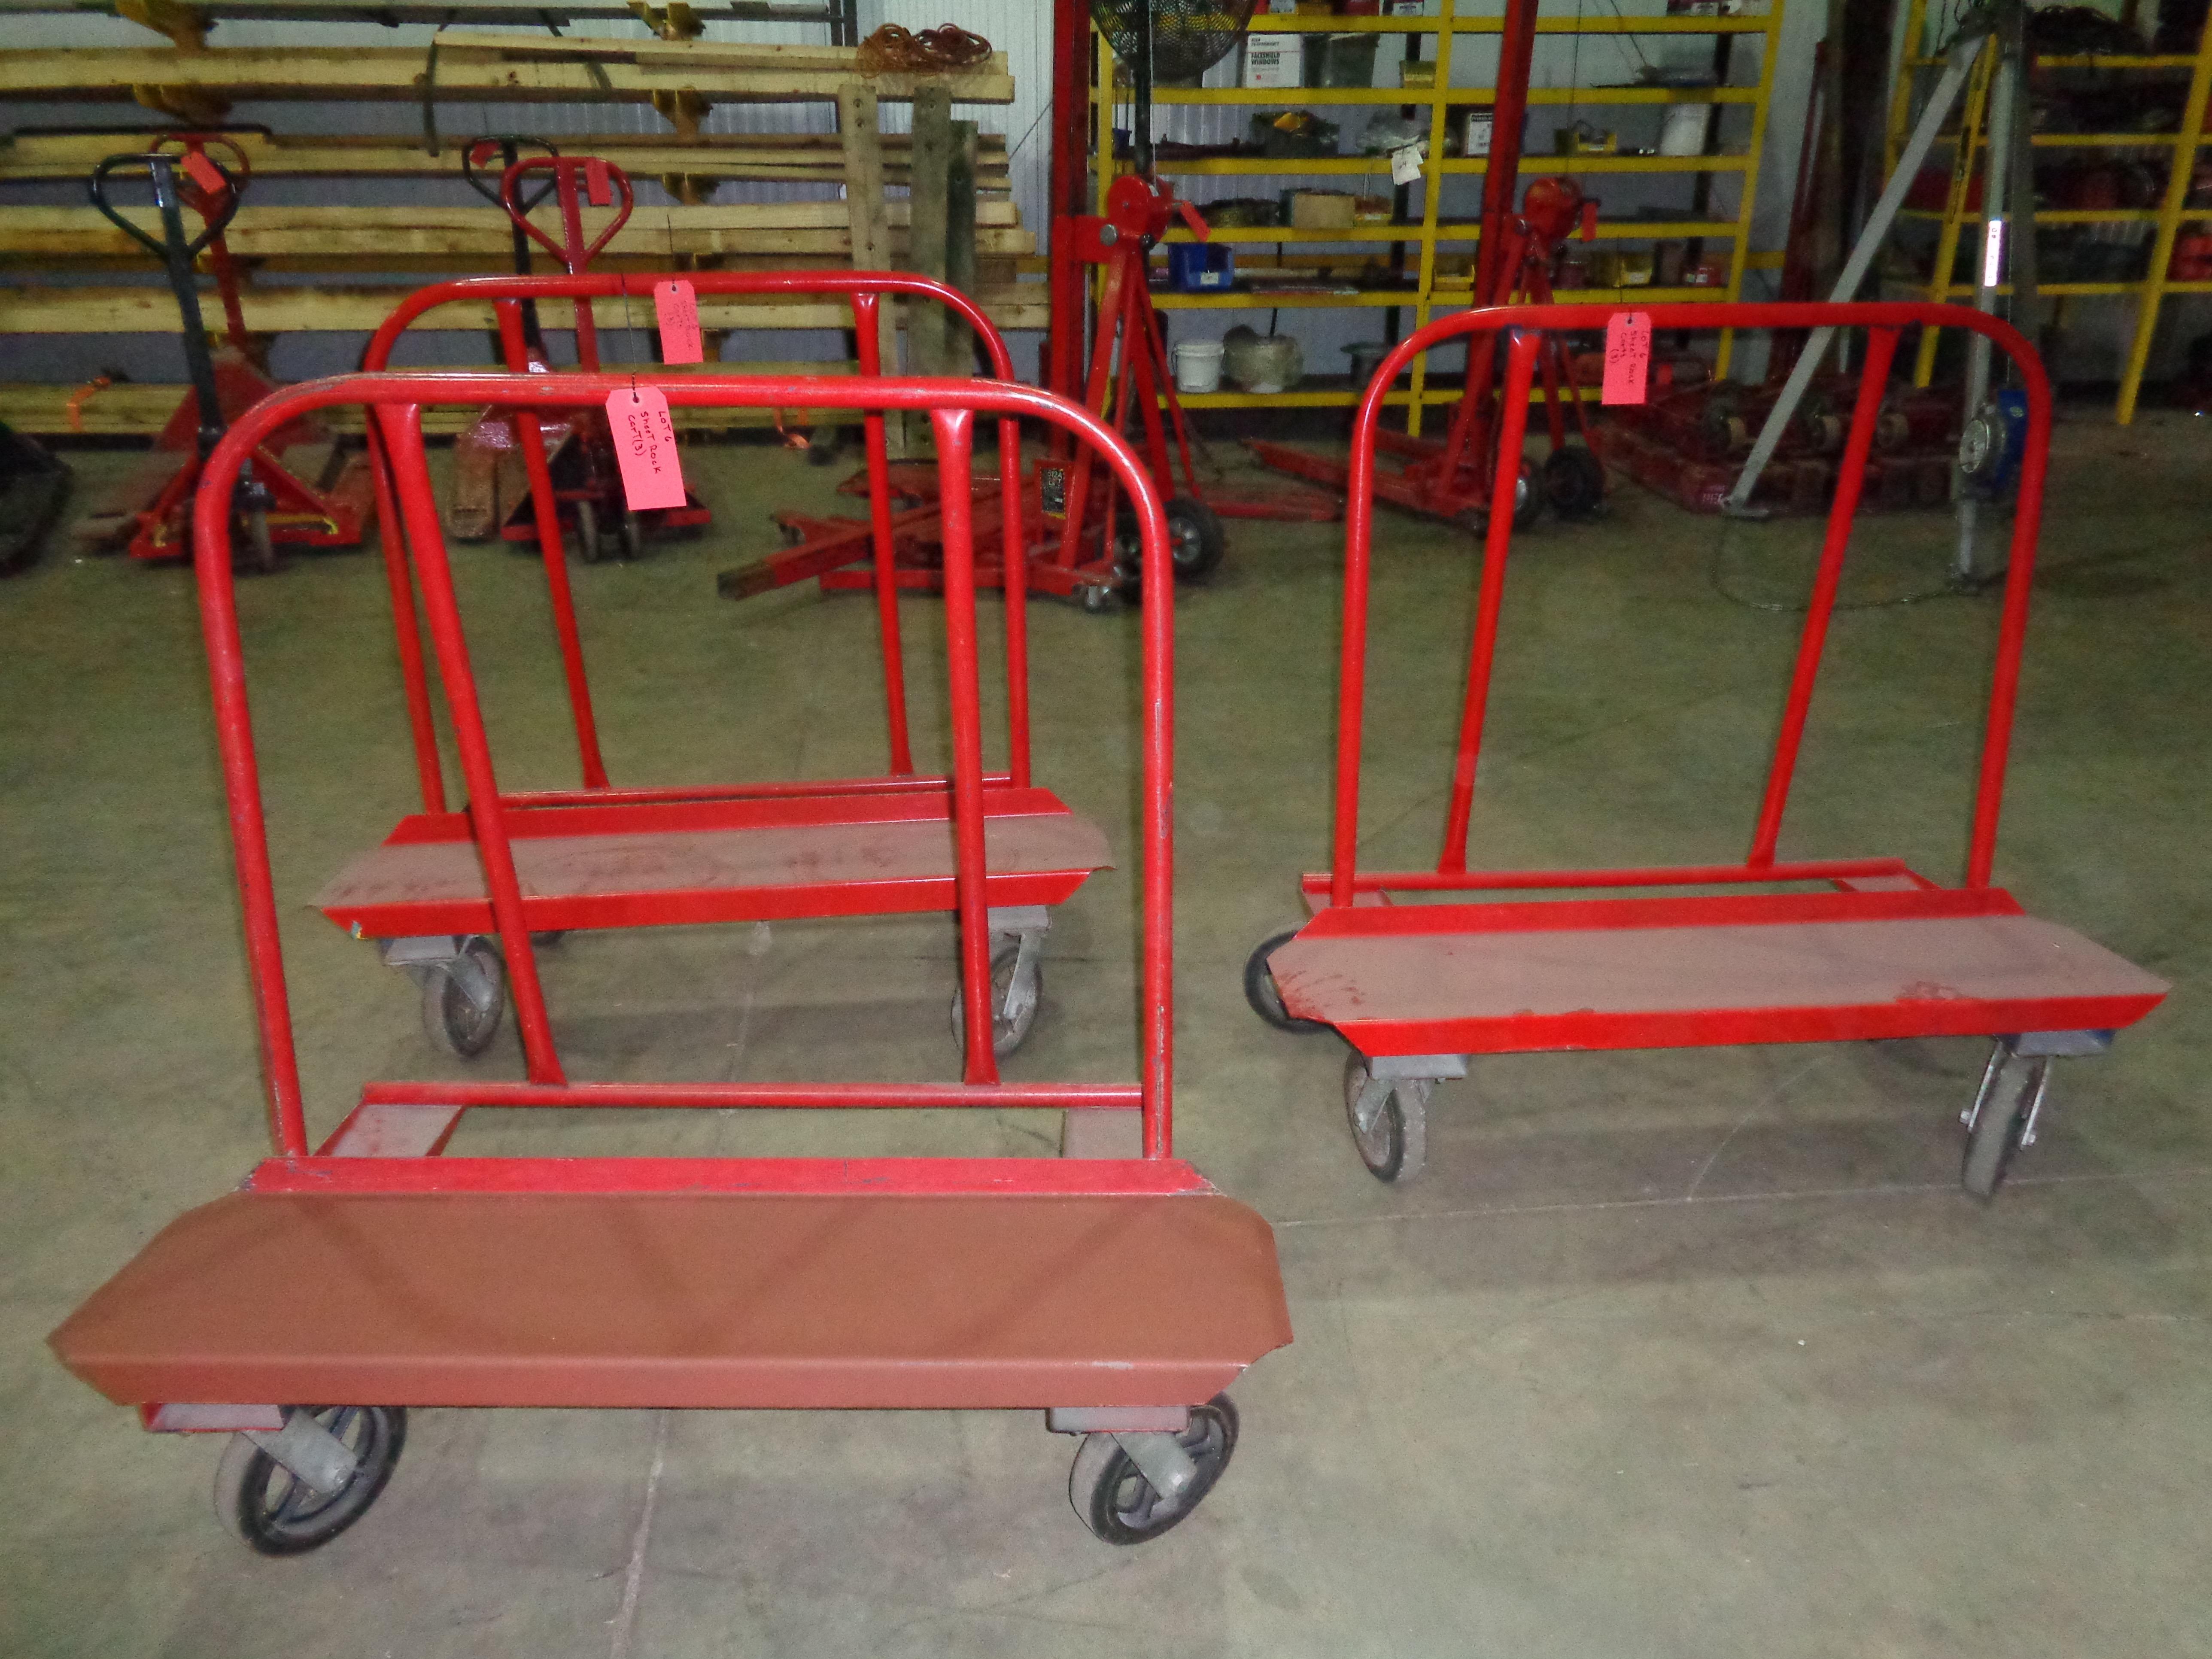 Lot of 3 - Jescraft Sheetrock Carts - Image 3 of 4